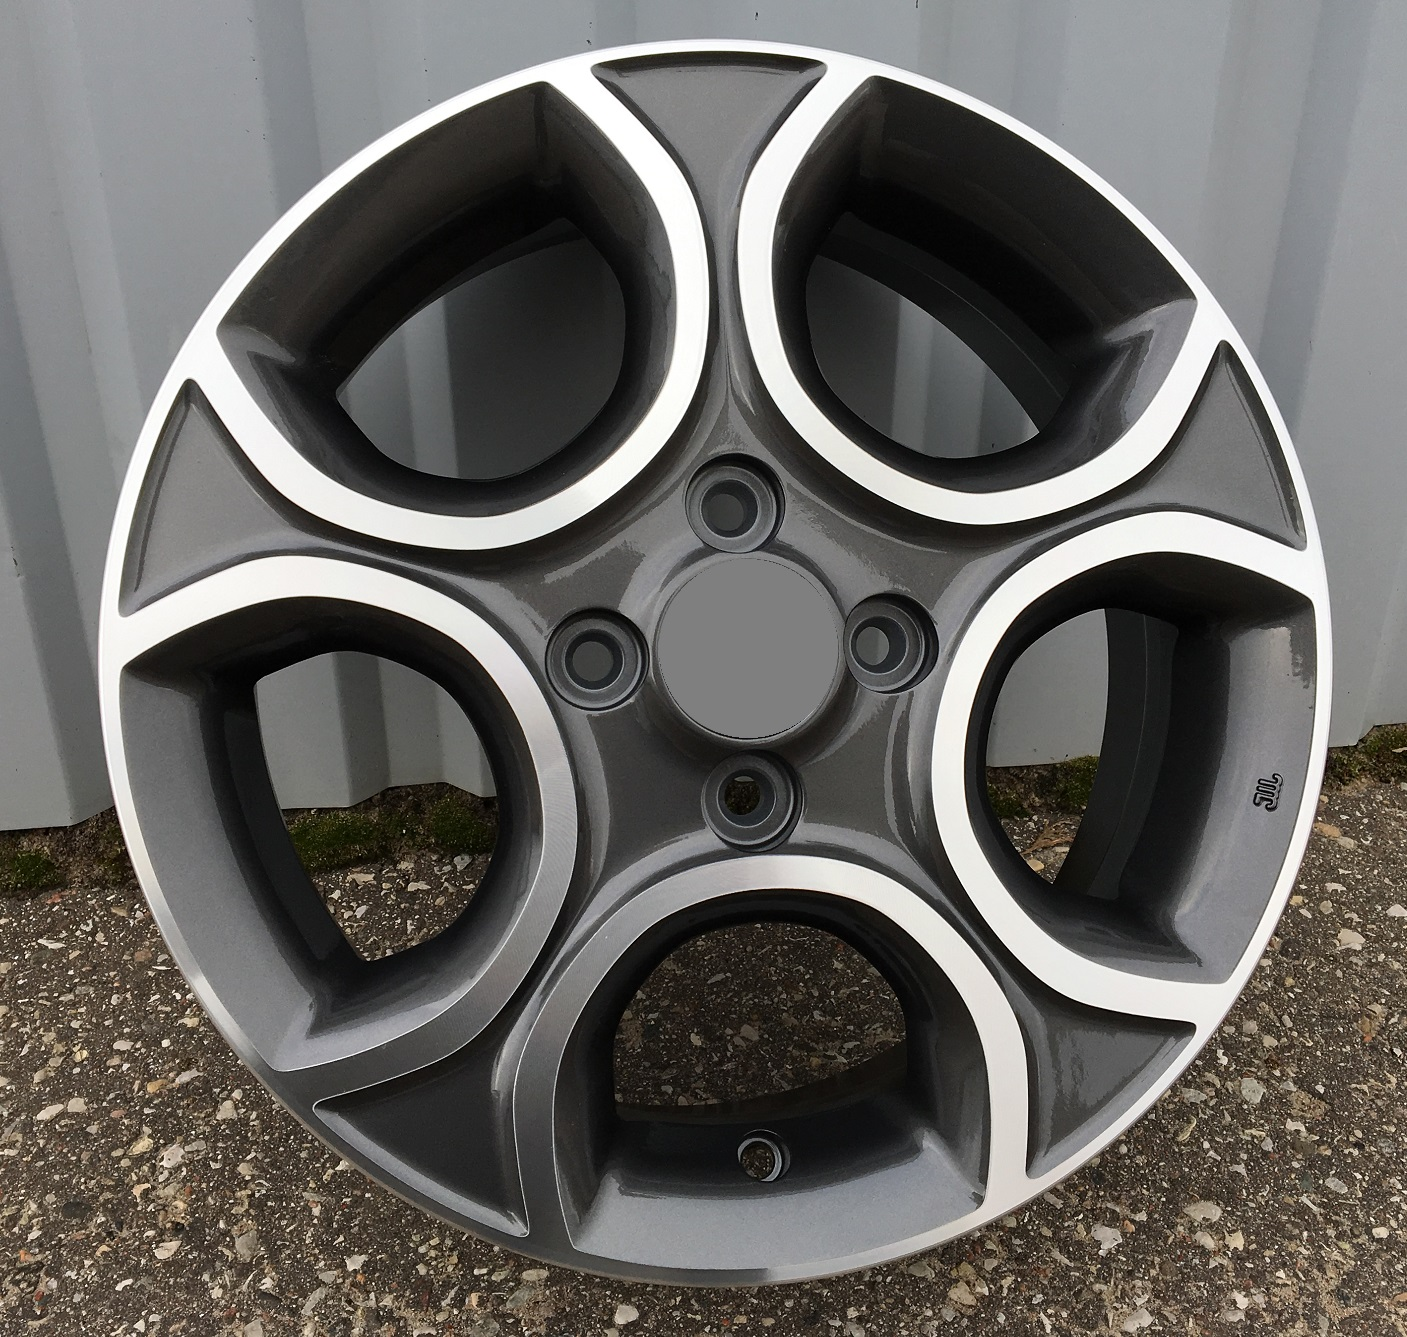 K15X5.5 4X100 ET52 54.1 BK5094 dark MG RWR KI (AKC 35)(D5) 5.5x15 ET52 4x100